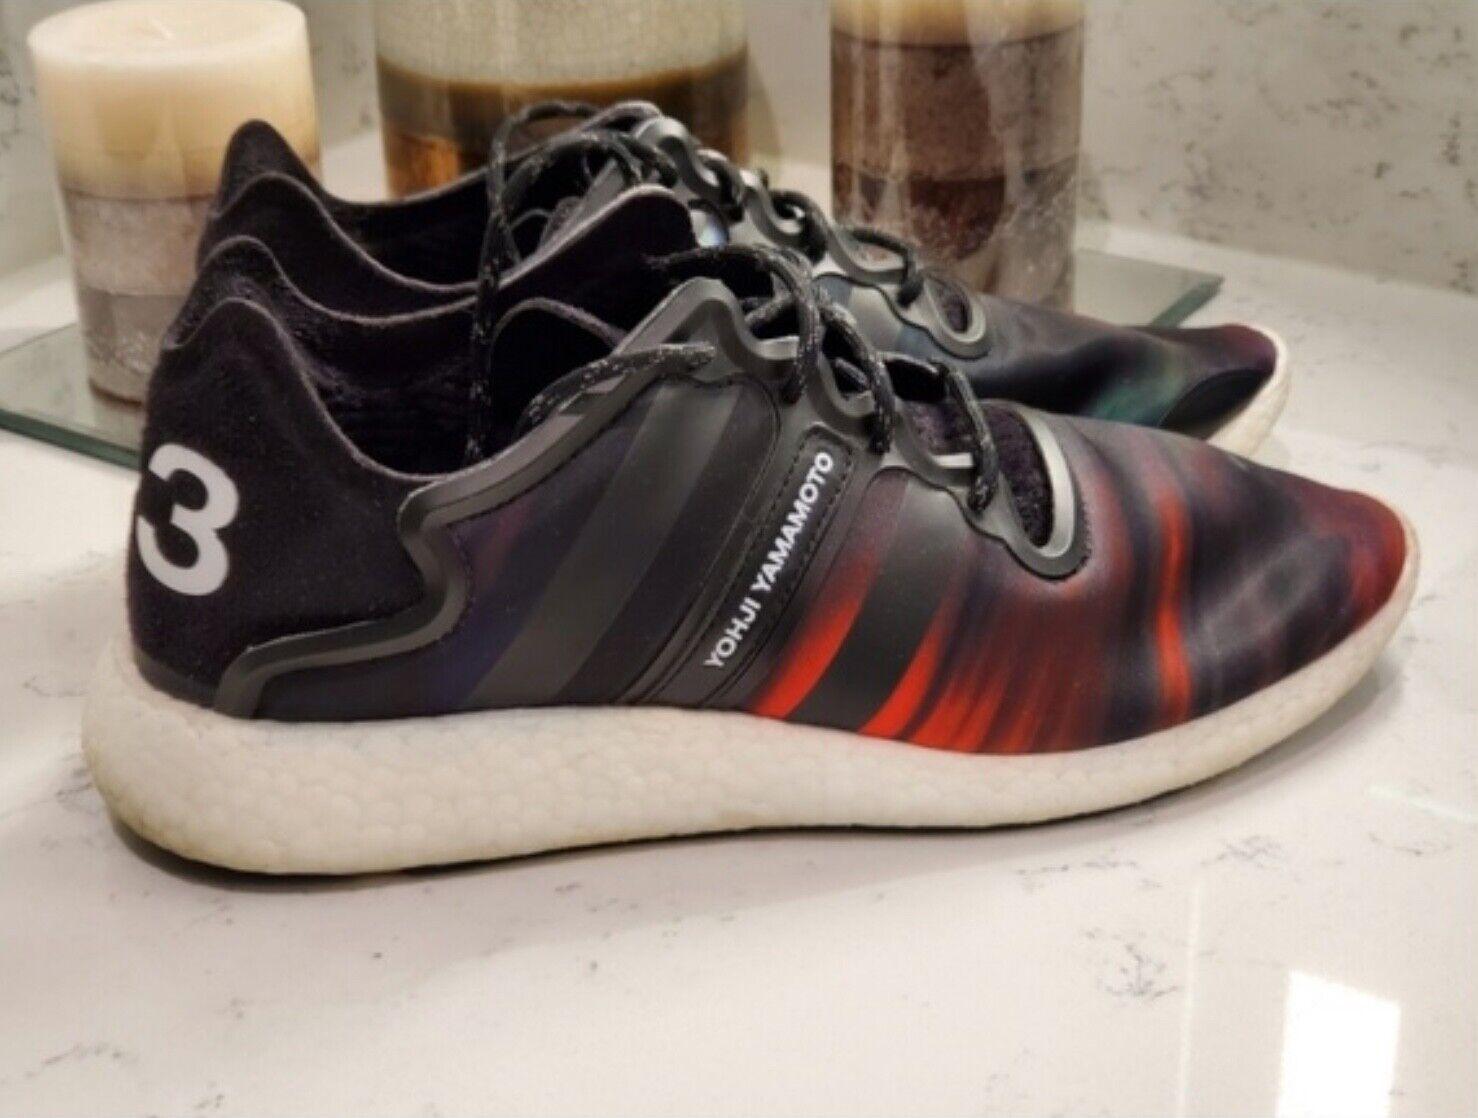 Yohji Yamamoto   Adidas Y -3 Turnschuhe, männer's, Größe 9 US